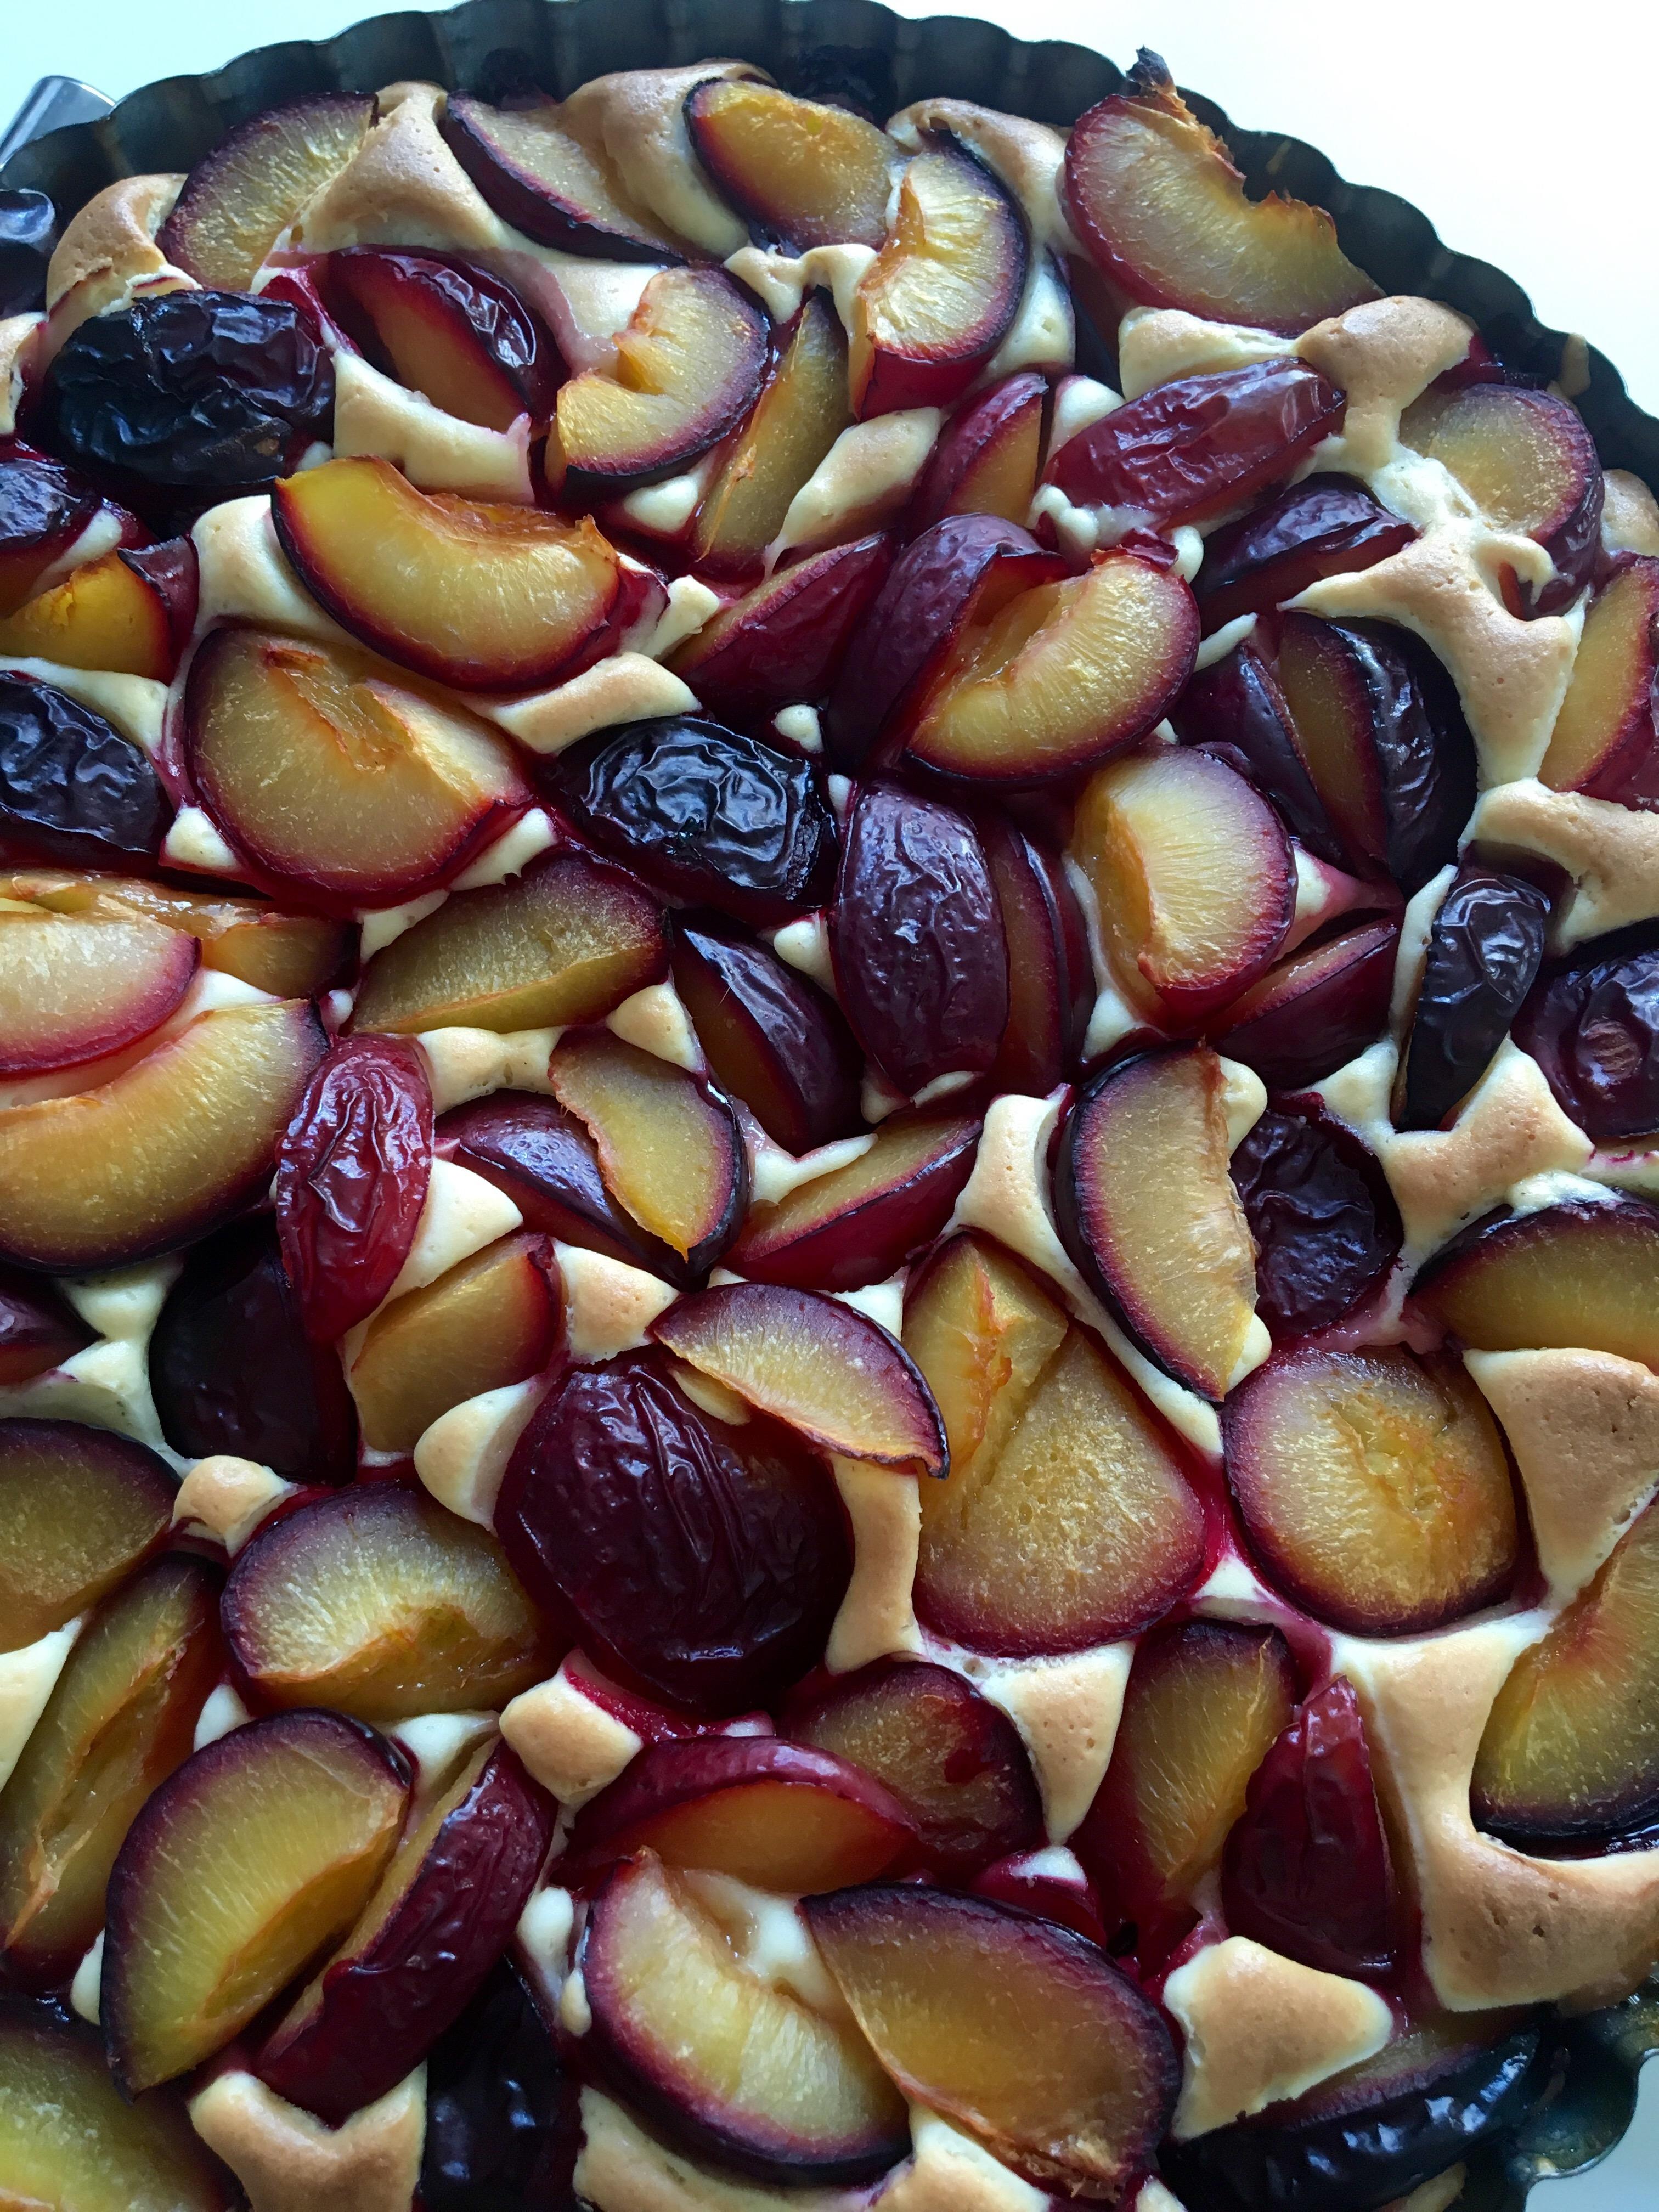 Pflaumenkuchen ruck zuck